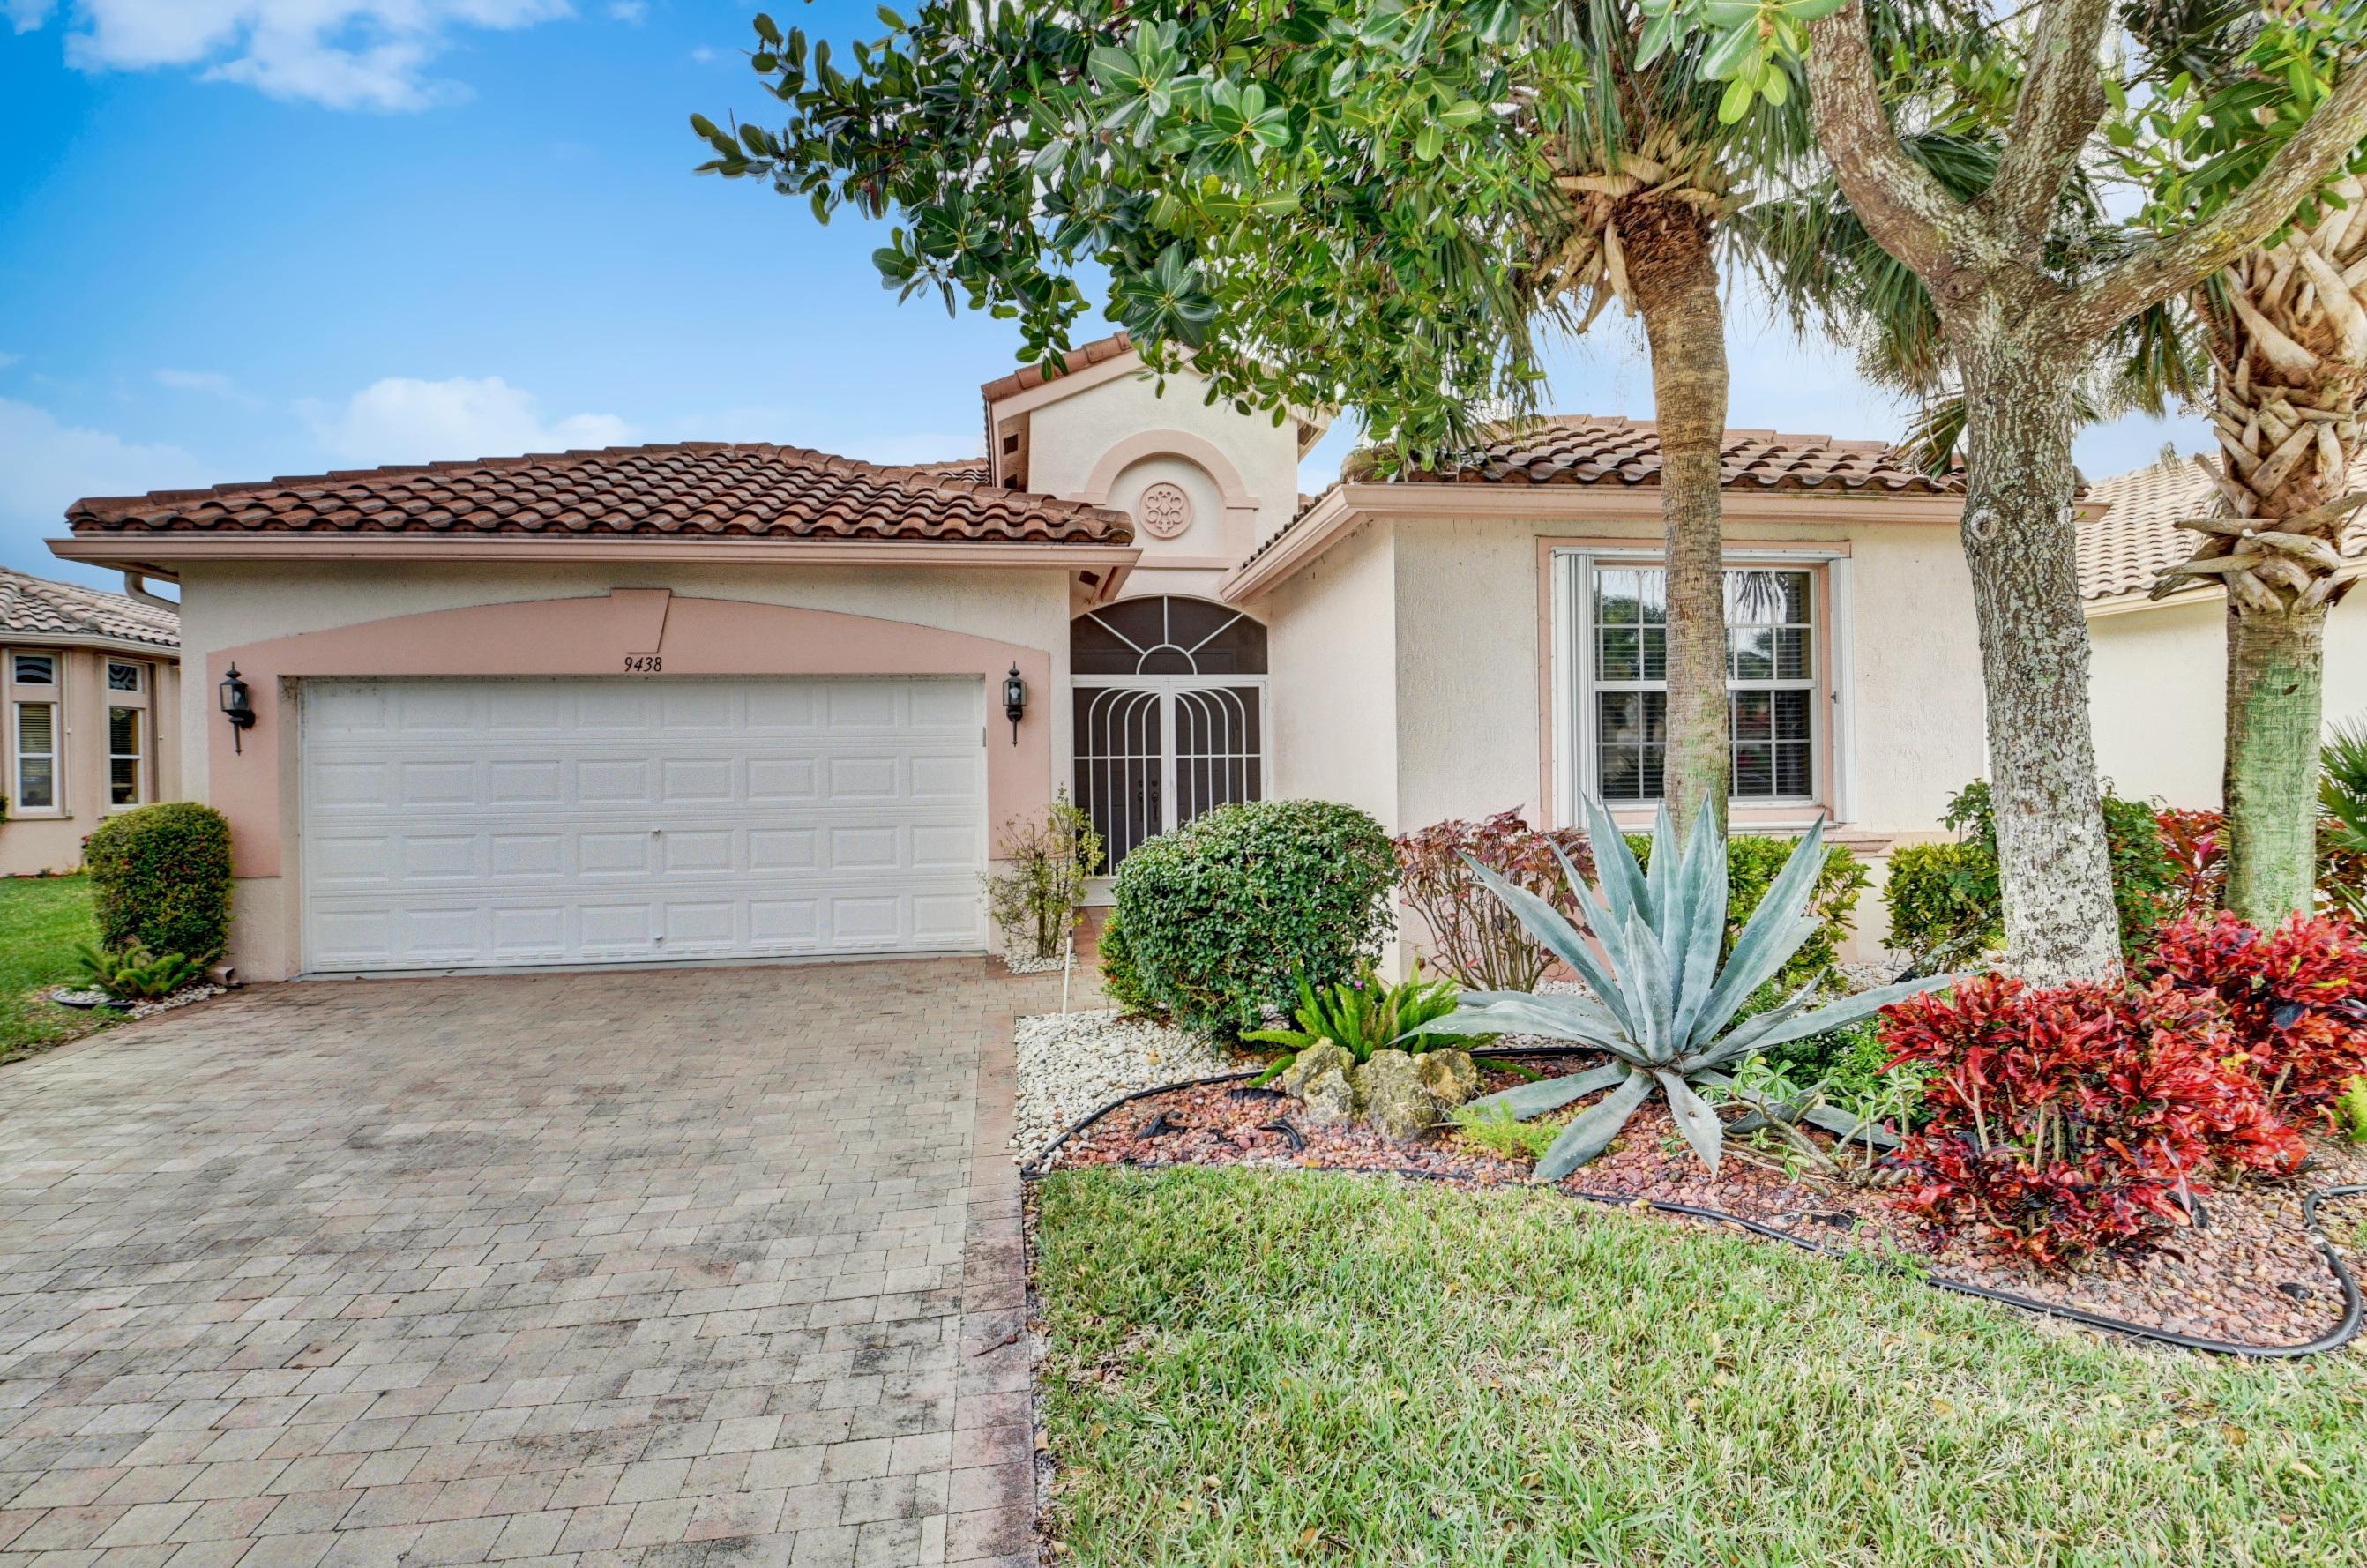 Bellaggio home 9438 Vercelli Street Lake Worth FL 33467